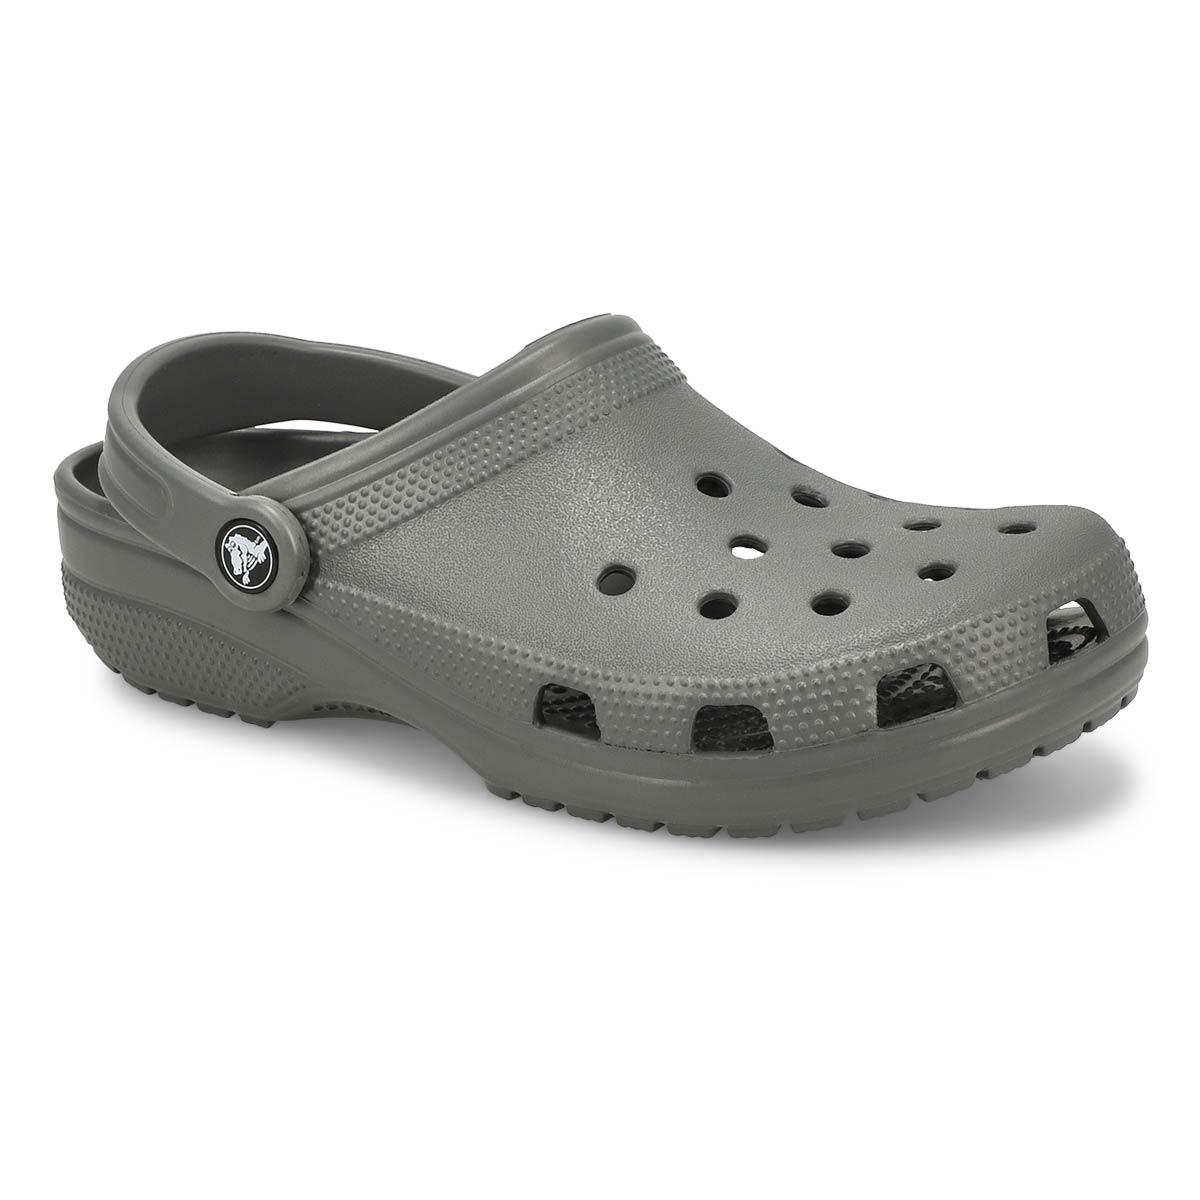 Lds Classic slate grey EVA comfort clog